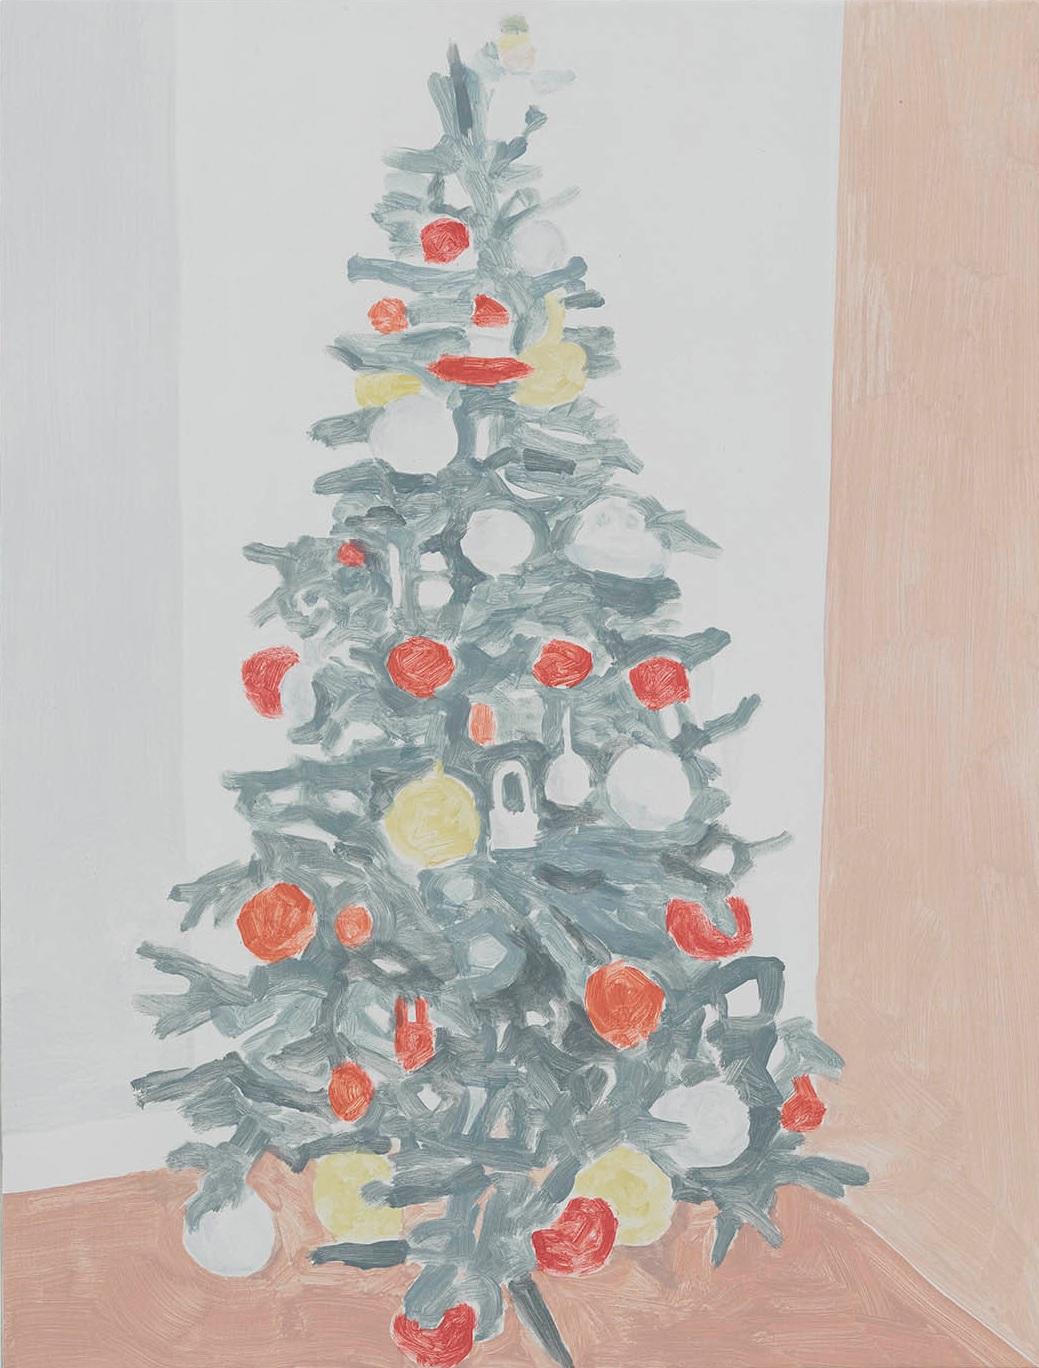 Xmas Tree (pompoms), acrylic on canvas, 32 x 24.25 inches, 2016.